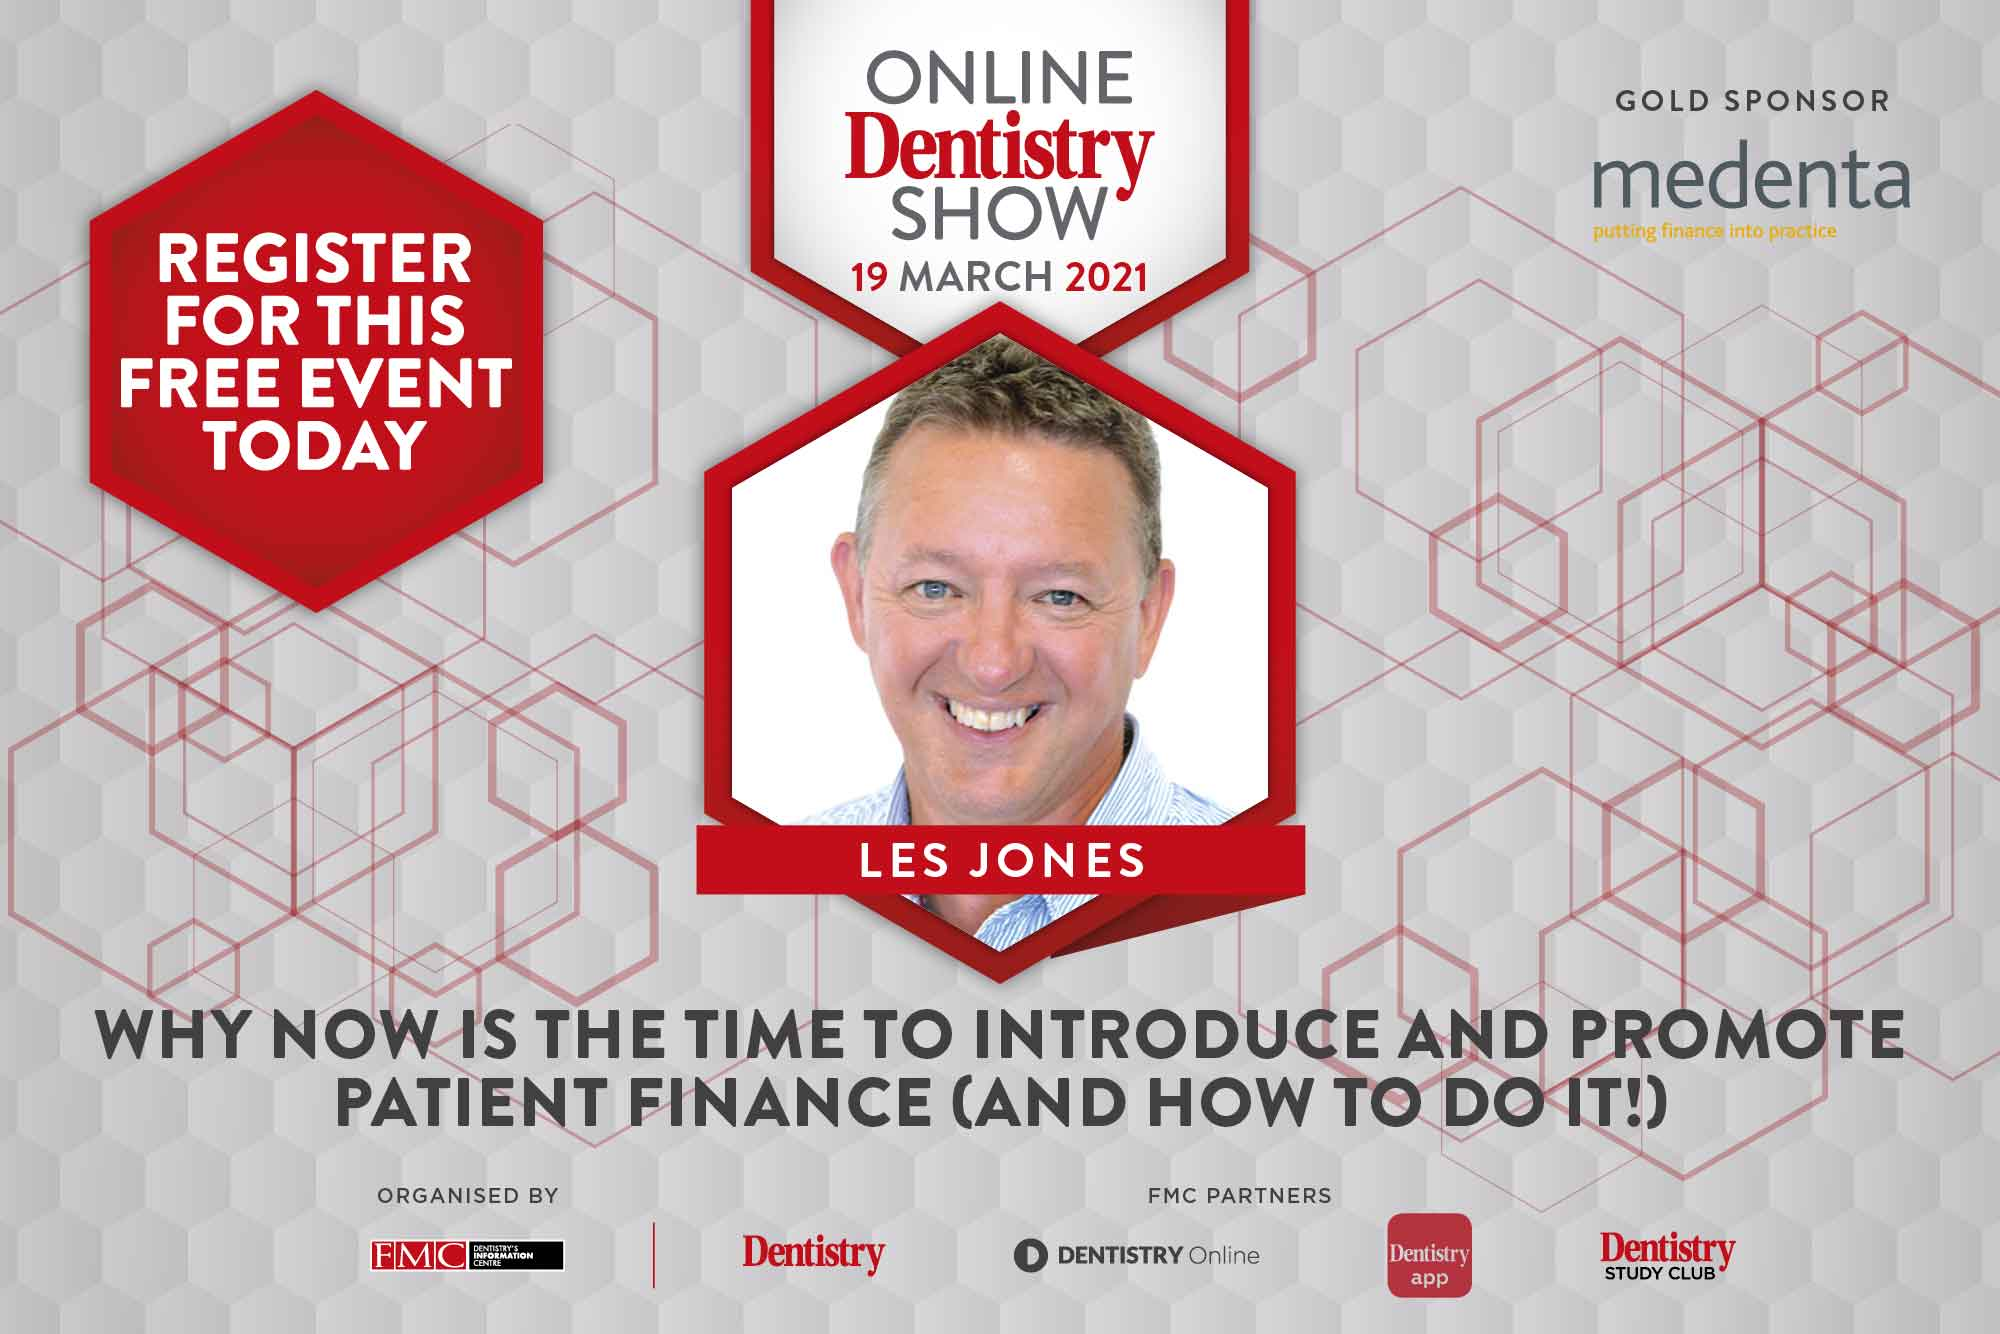 Online Dentistry Show Les Jones